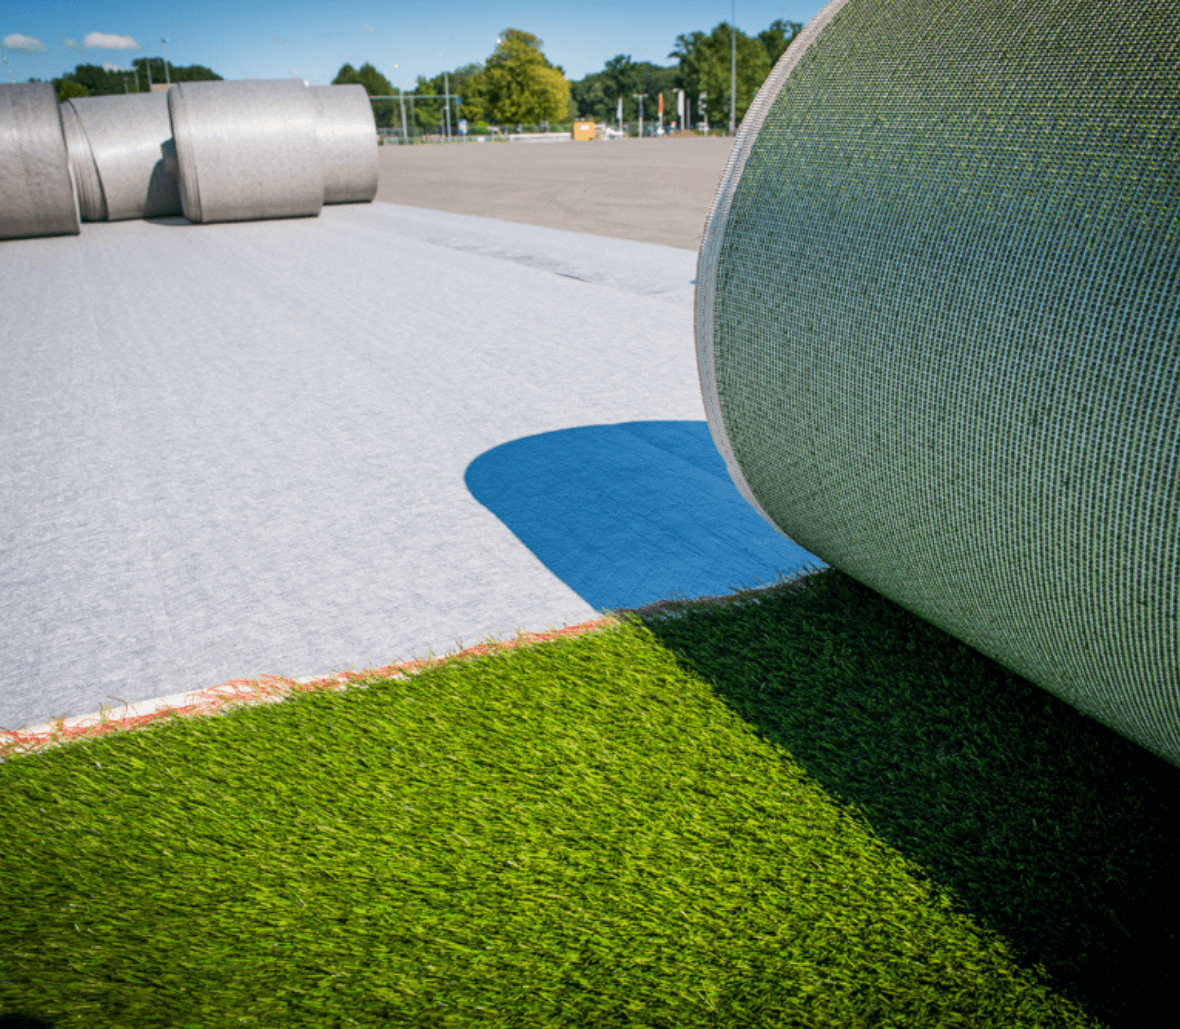 EnkaFlex_shockpad & drainage system for sportsfields_copyrights Low & Bonar_Enka Solutions